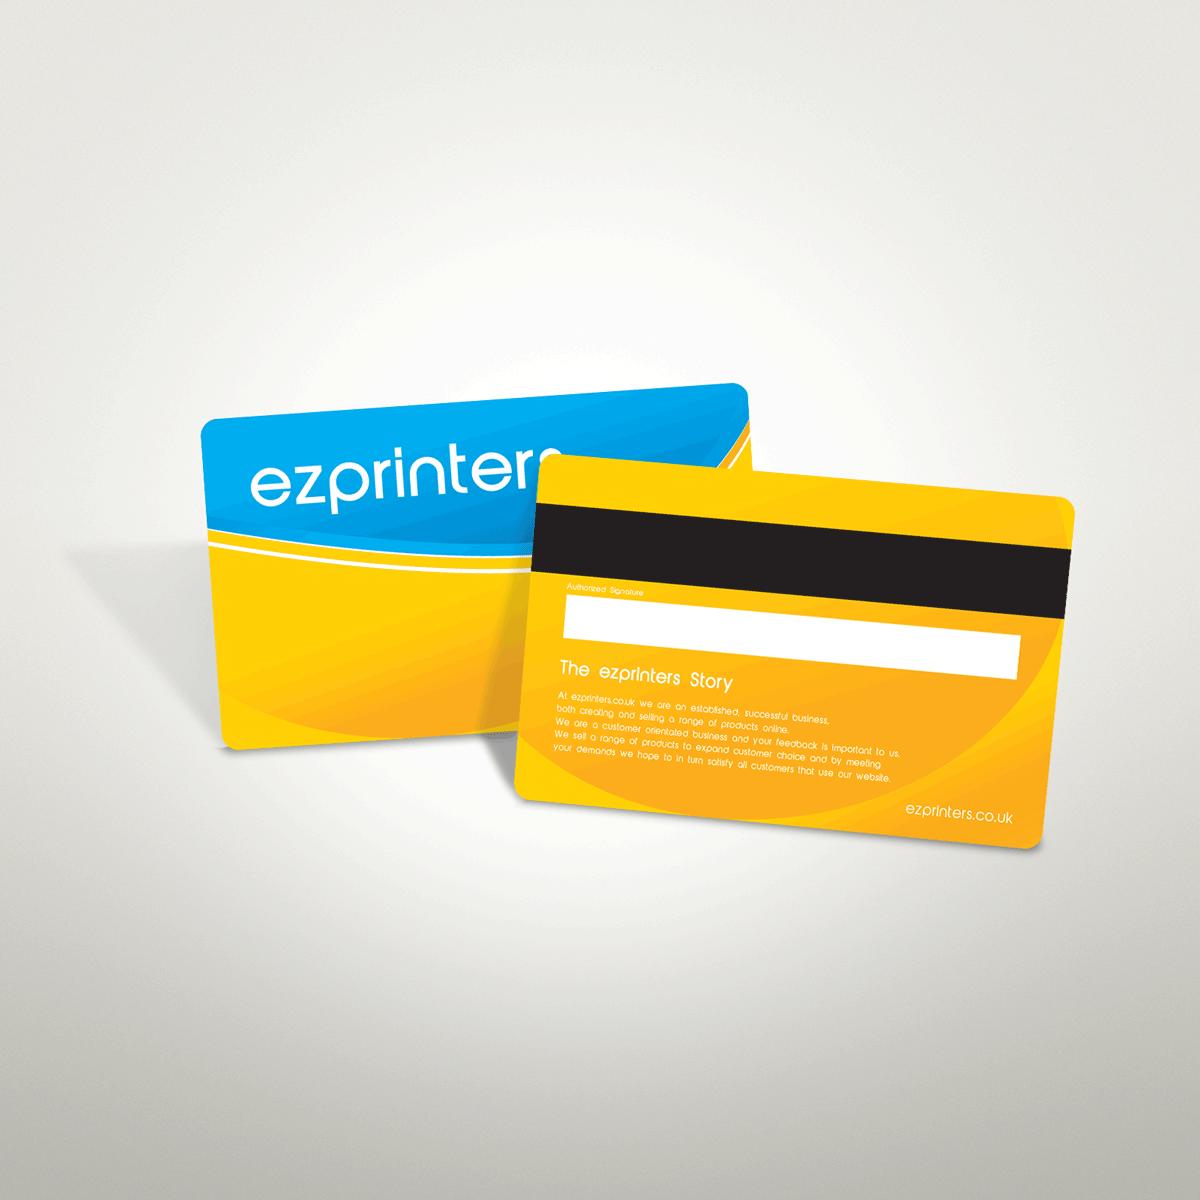 cheap high quality plastic card printing company in london e1 near me